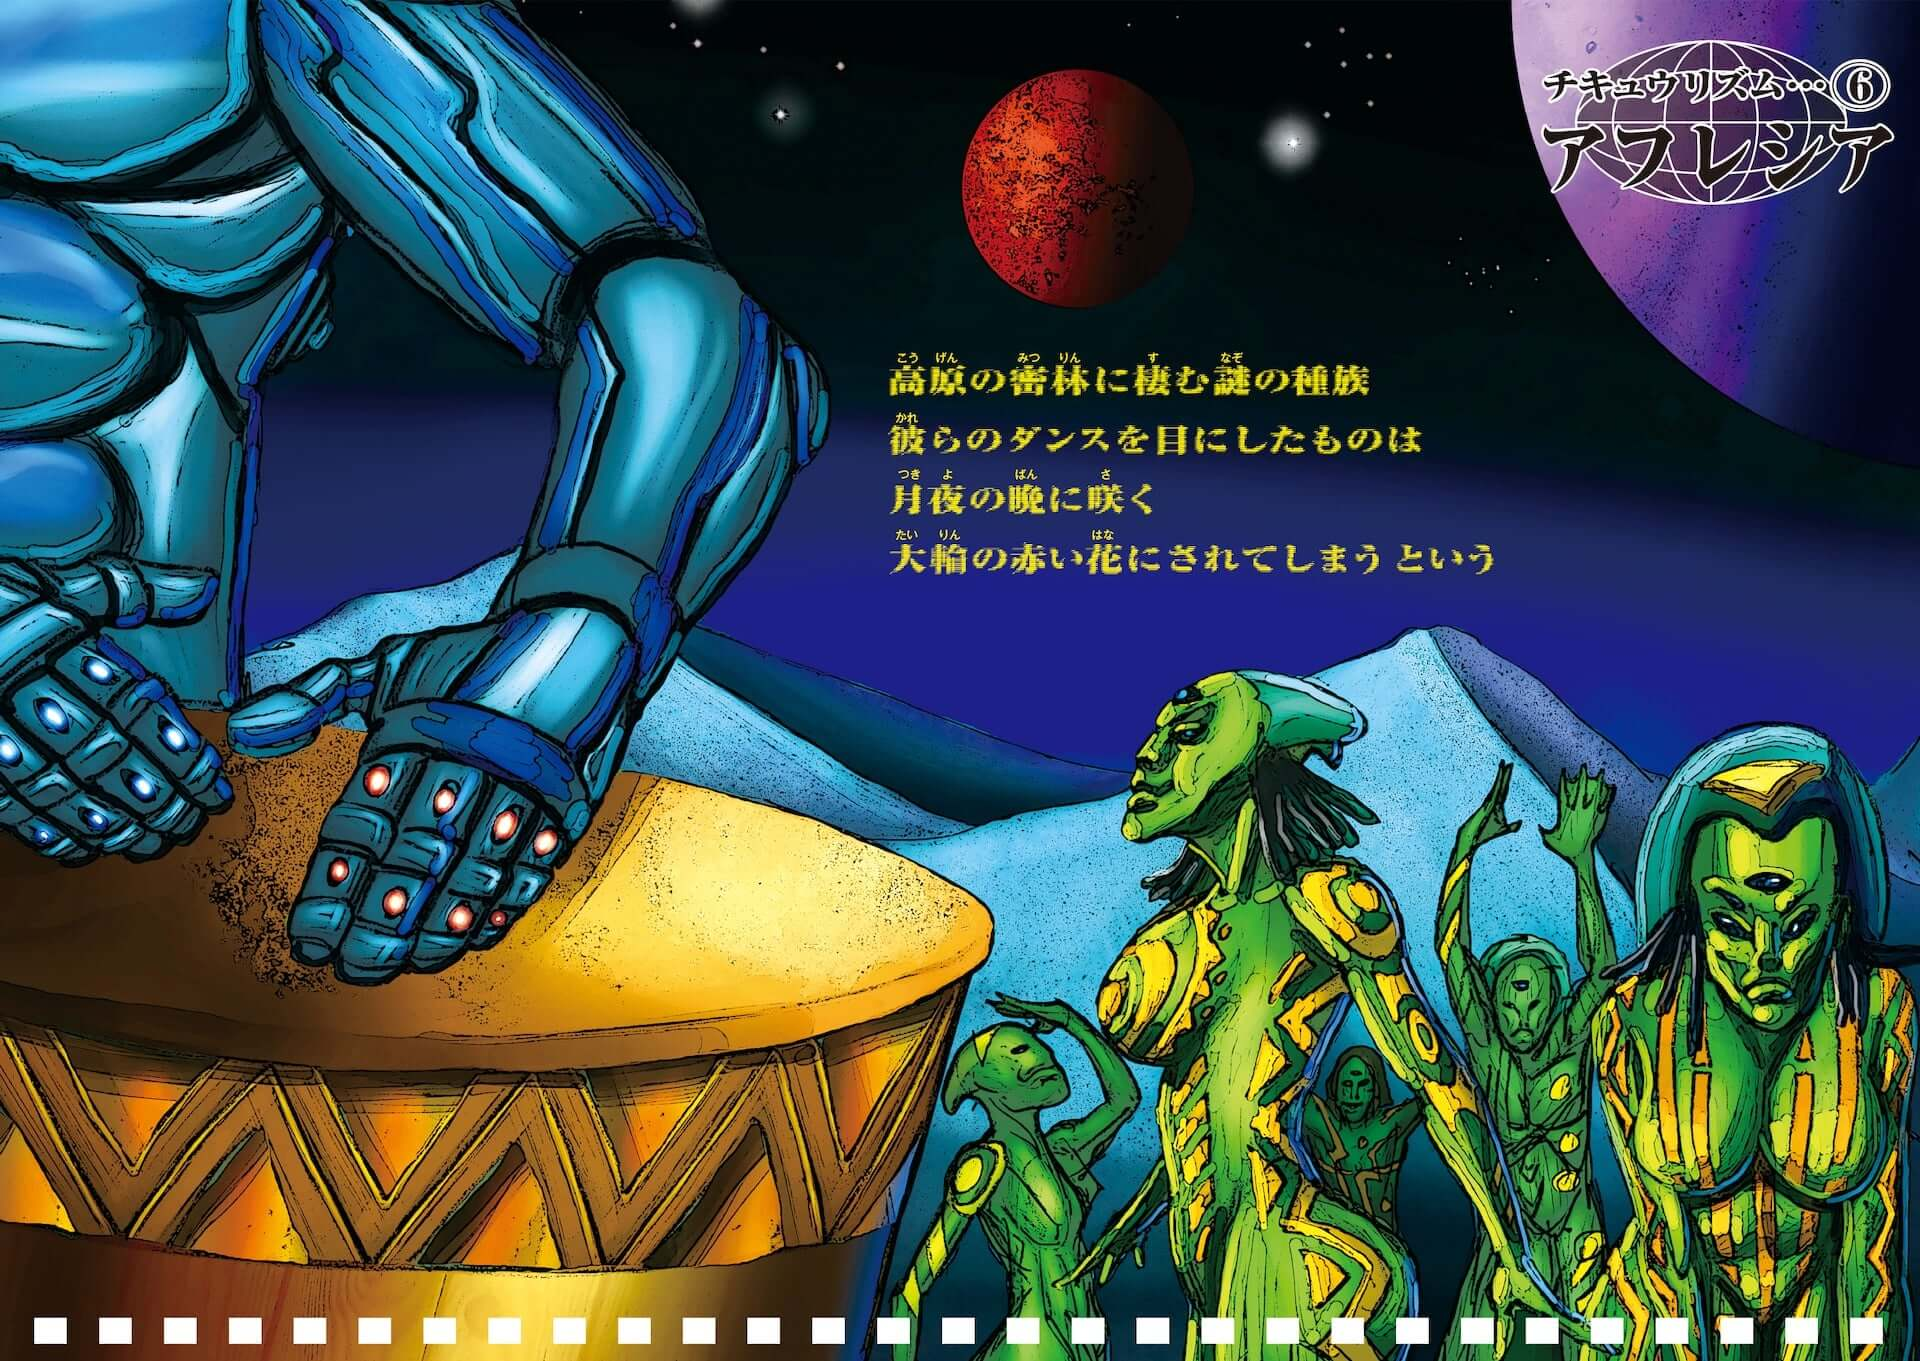 "『TR-808』をモチーフにした児童書を小林""ミミ""泉美が執筆!『エイト・オー・エイト - 声と手拍子で遊ぶリズム絵本 -』が発売決定 art210115_monogon_2-1920x1361"